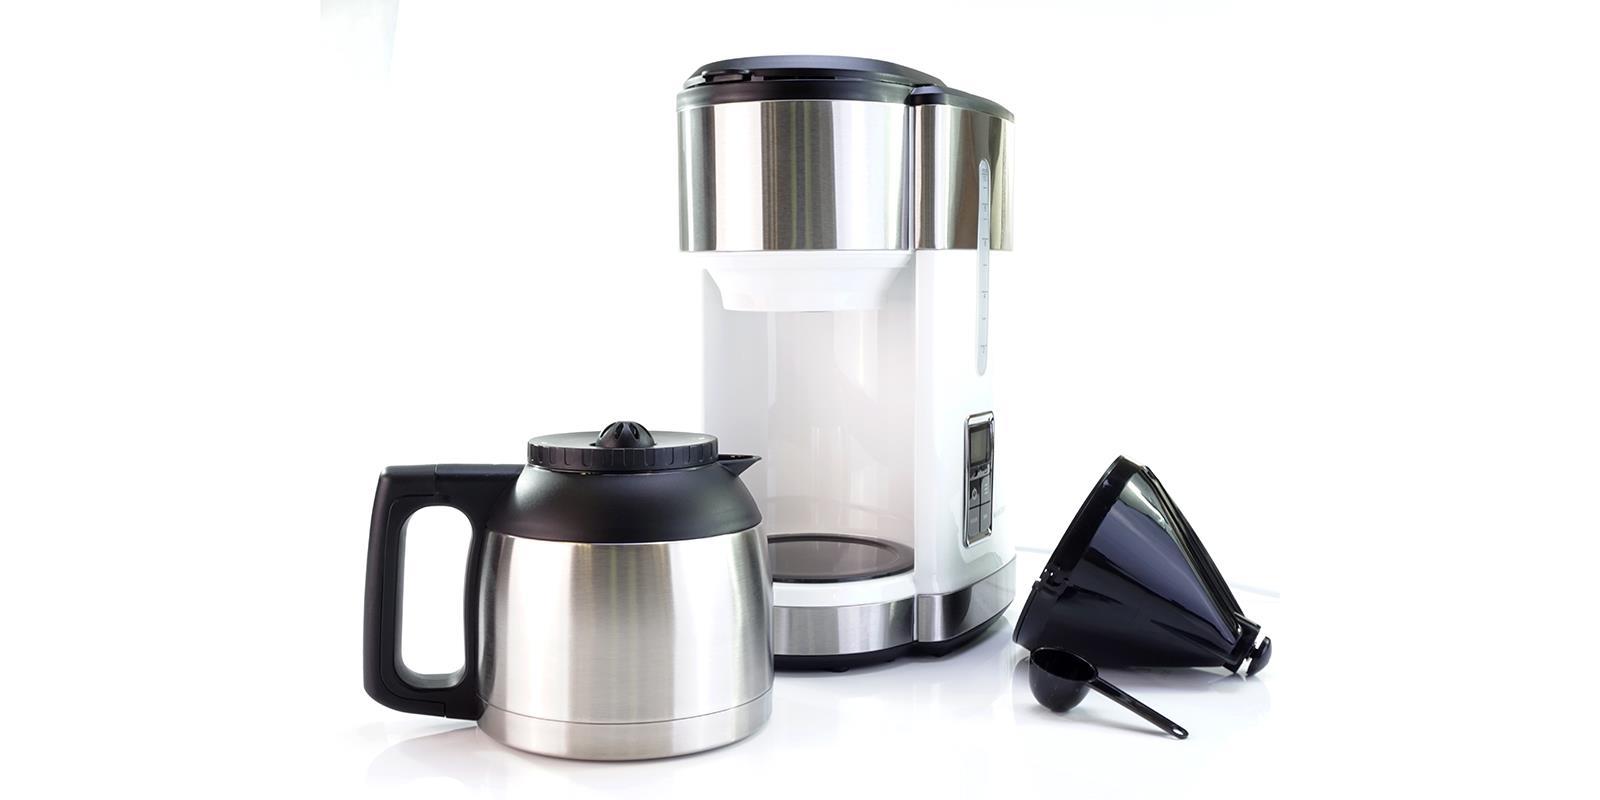 kaffeemaschine design eds mit thermoskanne timer skmd 1000 a1 weiss ebay. Black Bedroom Furniture Sets. Home Design Ideas